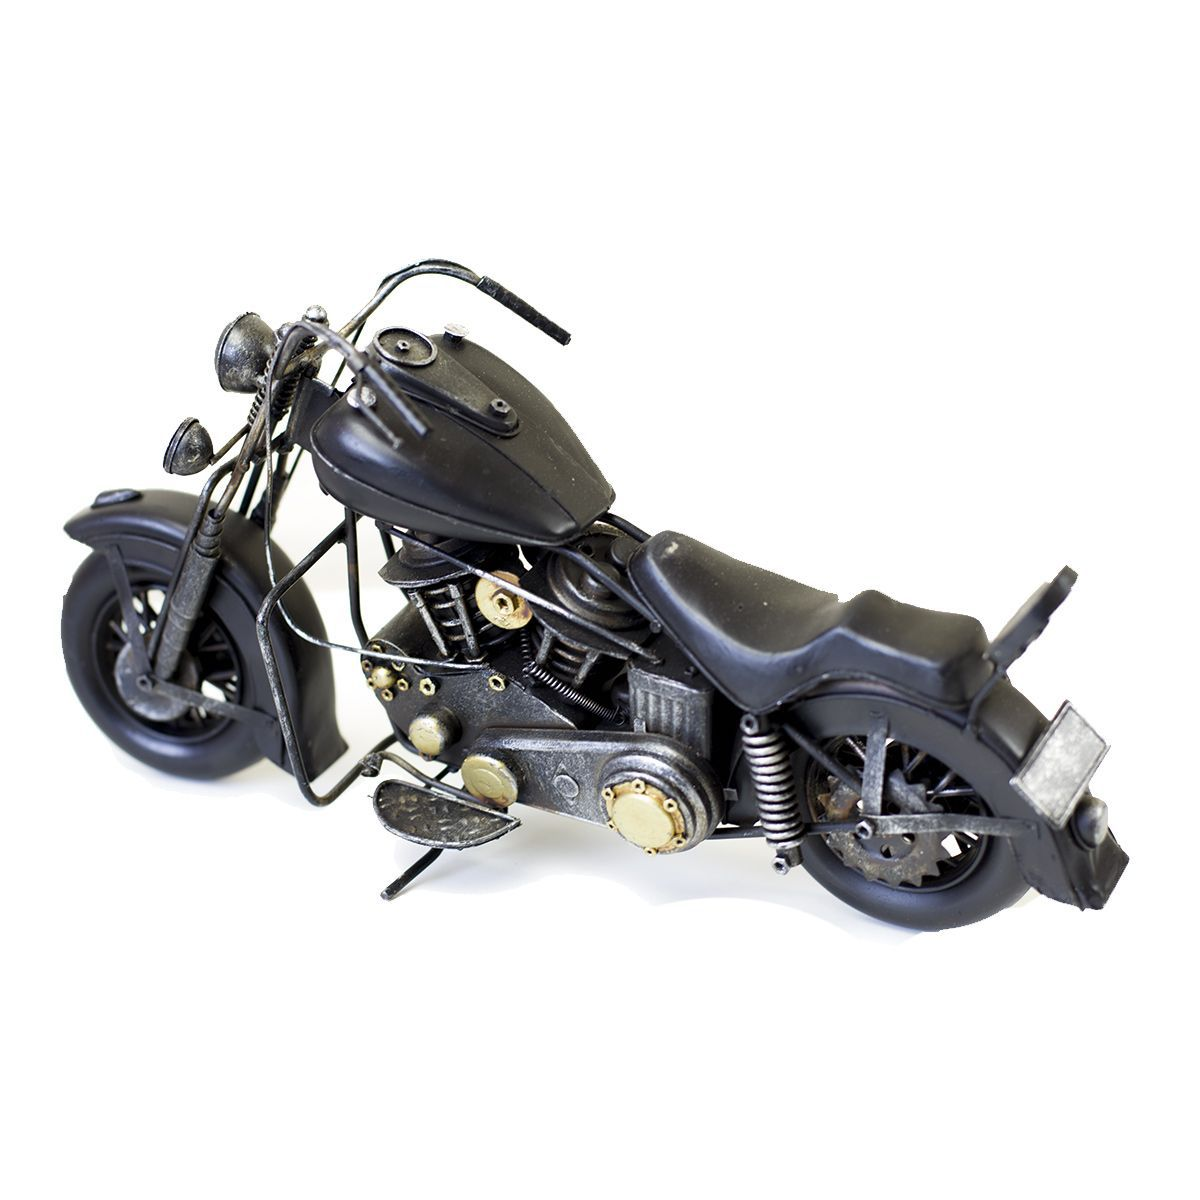 Moto Vintage decorativa de Metal Black & Ferrugem